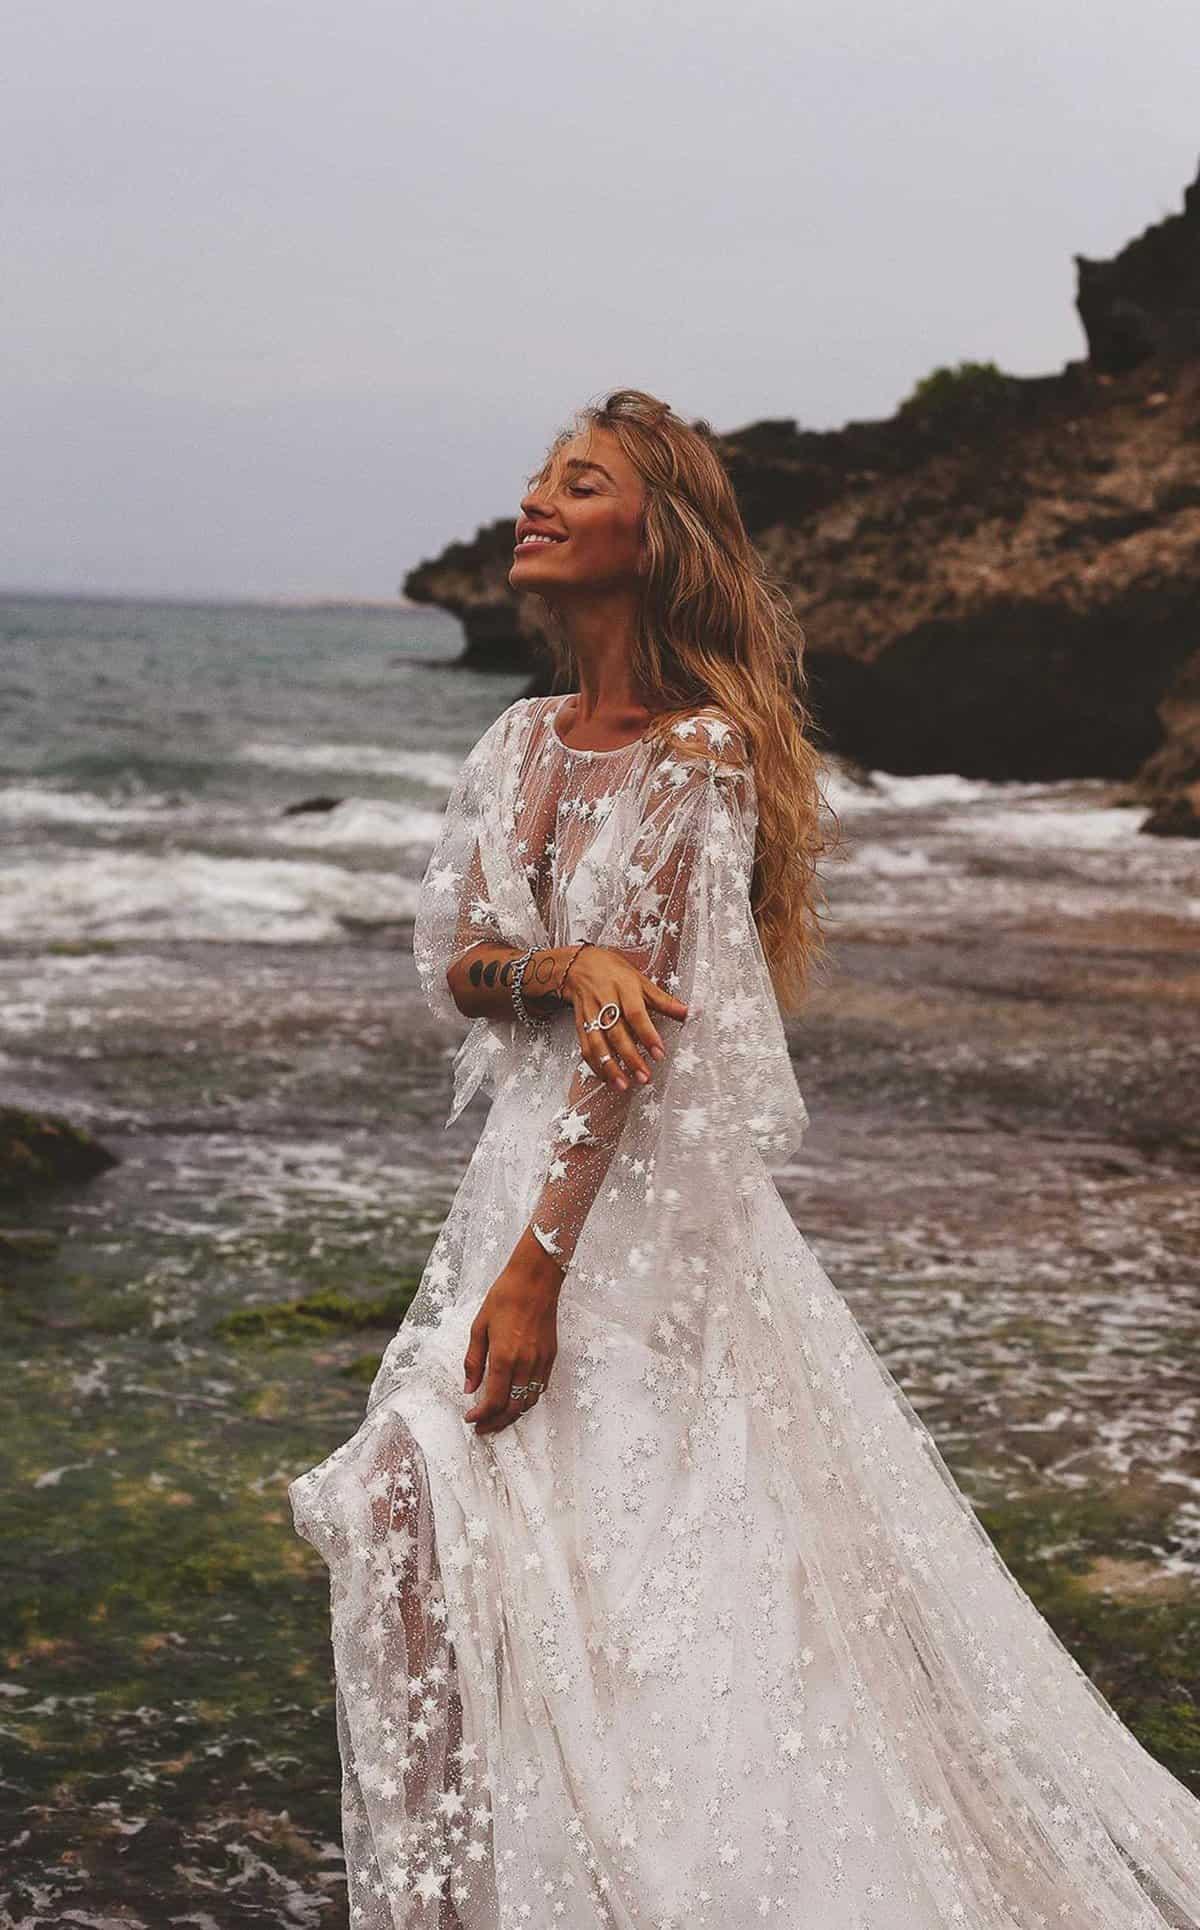 counting-stars-boho-vintage-galaxy-themed-wedding-dress